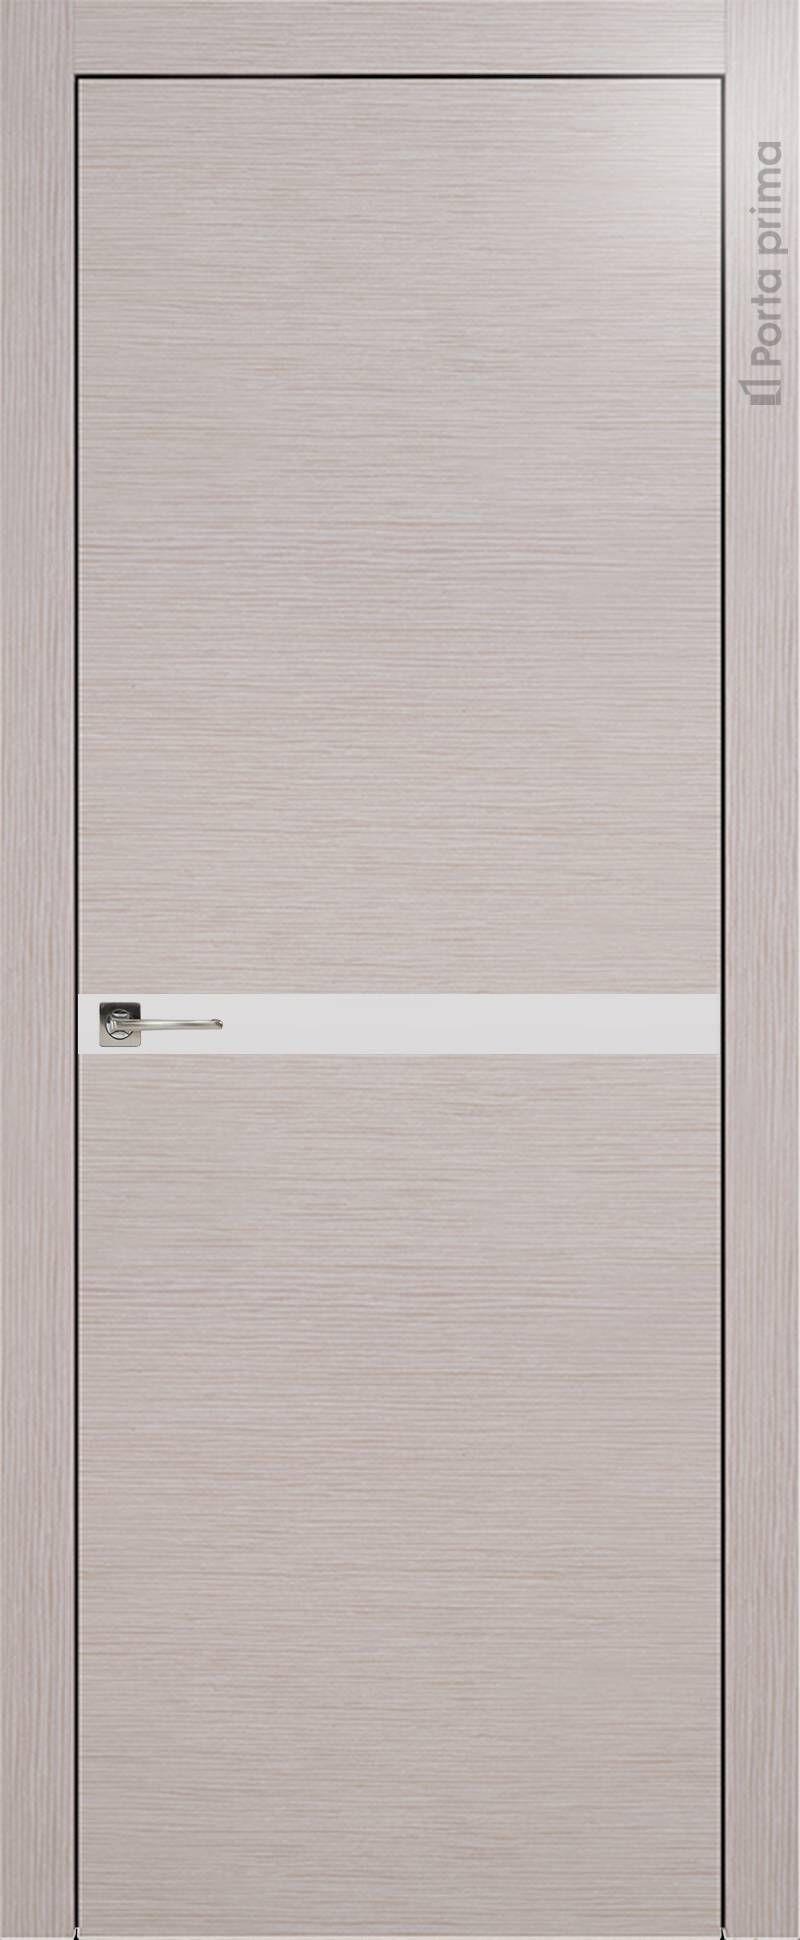 Tivoli Б-4 цвет - Дымчатый дуб Без стекла (ДГ)